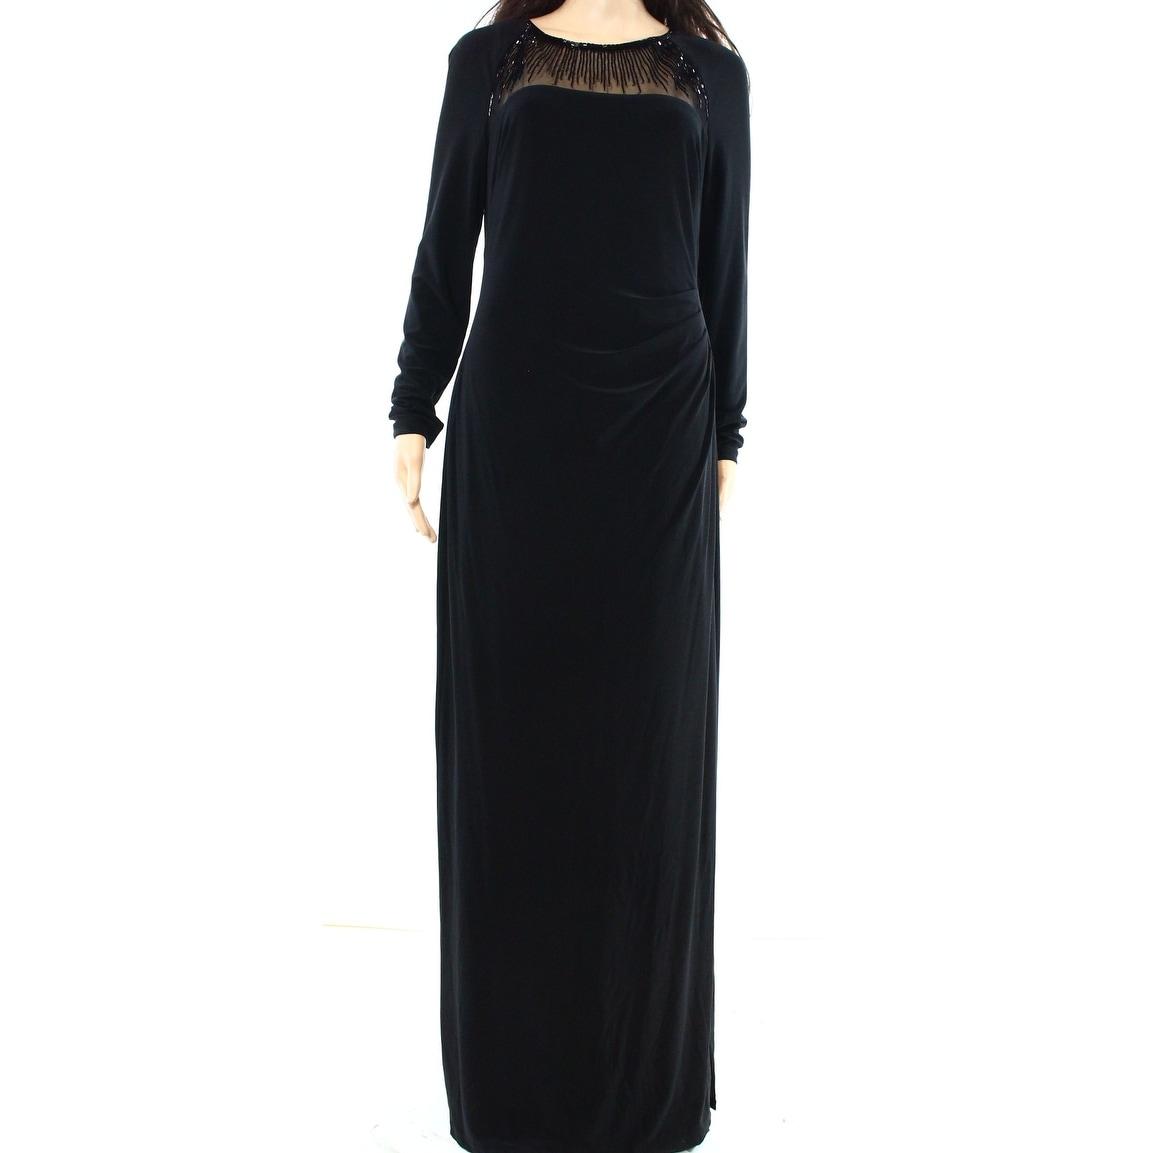 99584d94202 Womens Maxi Dresses At Macys - AByte Computer Solutions